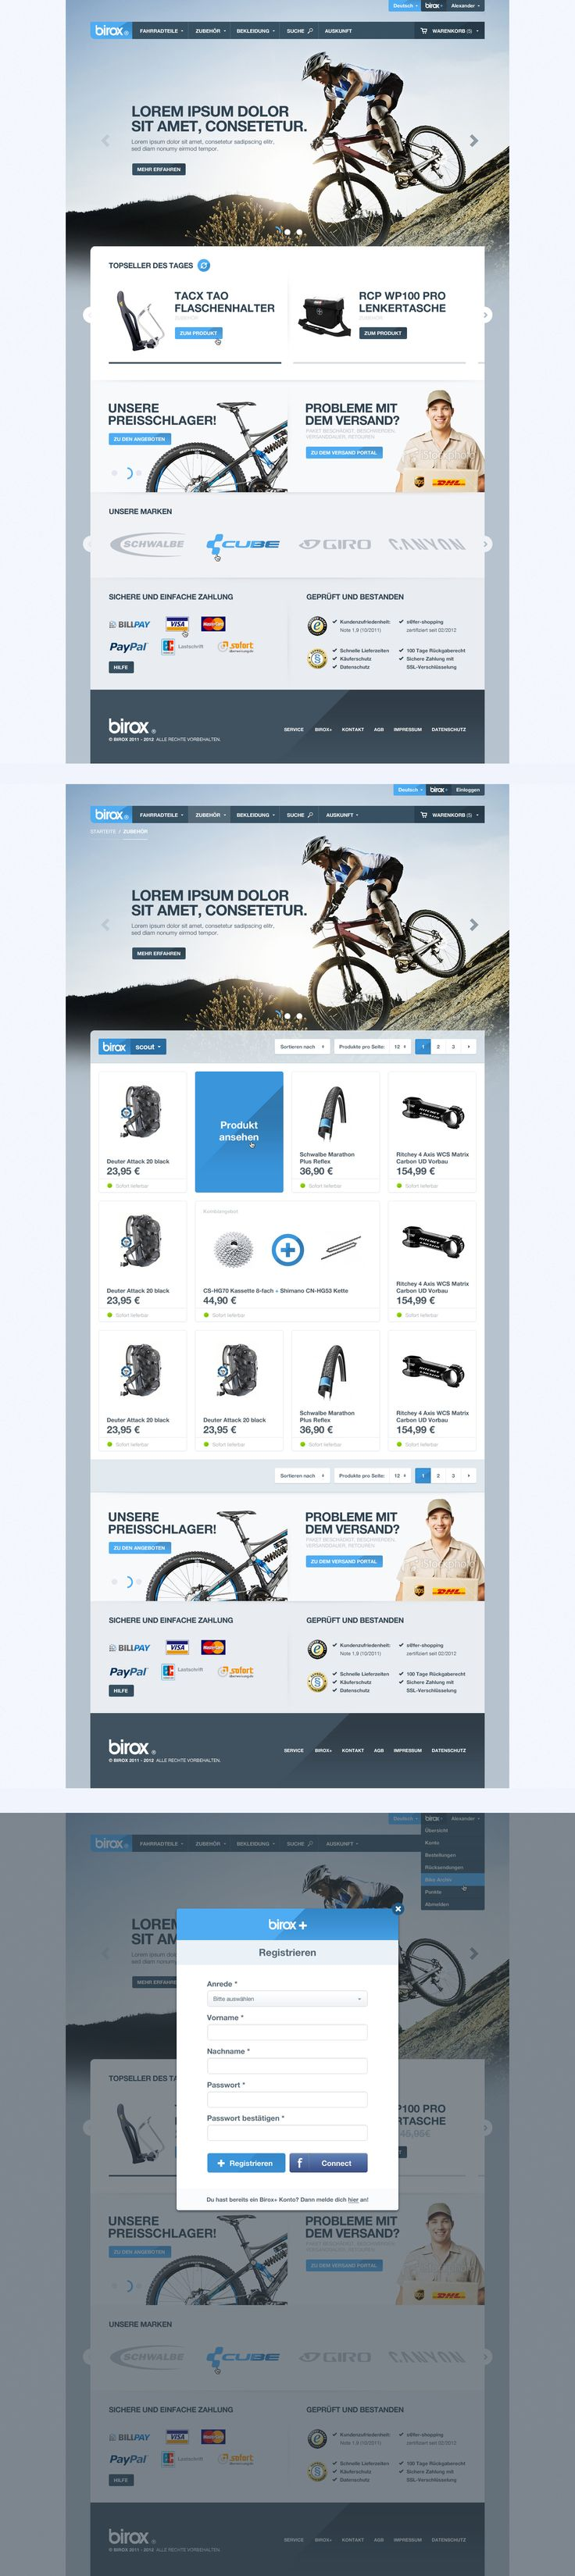 BIROX Online Store by cPl92.deviantart.com on @deviantART